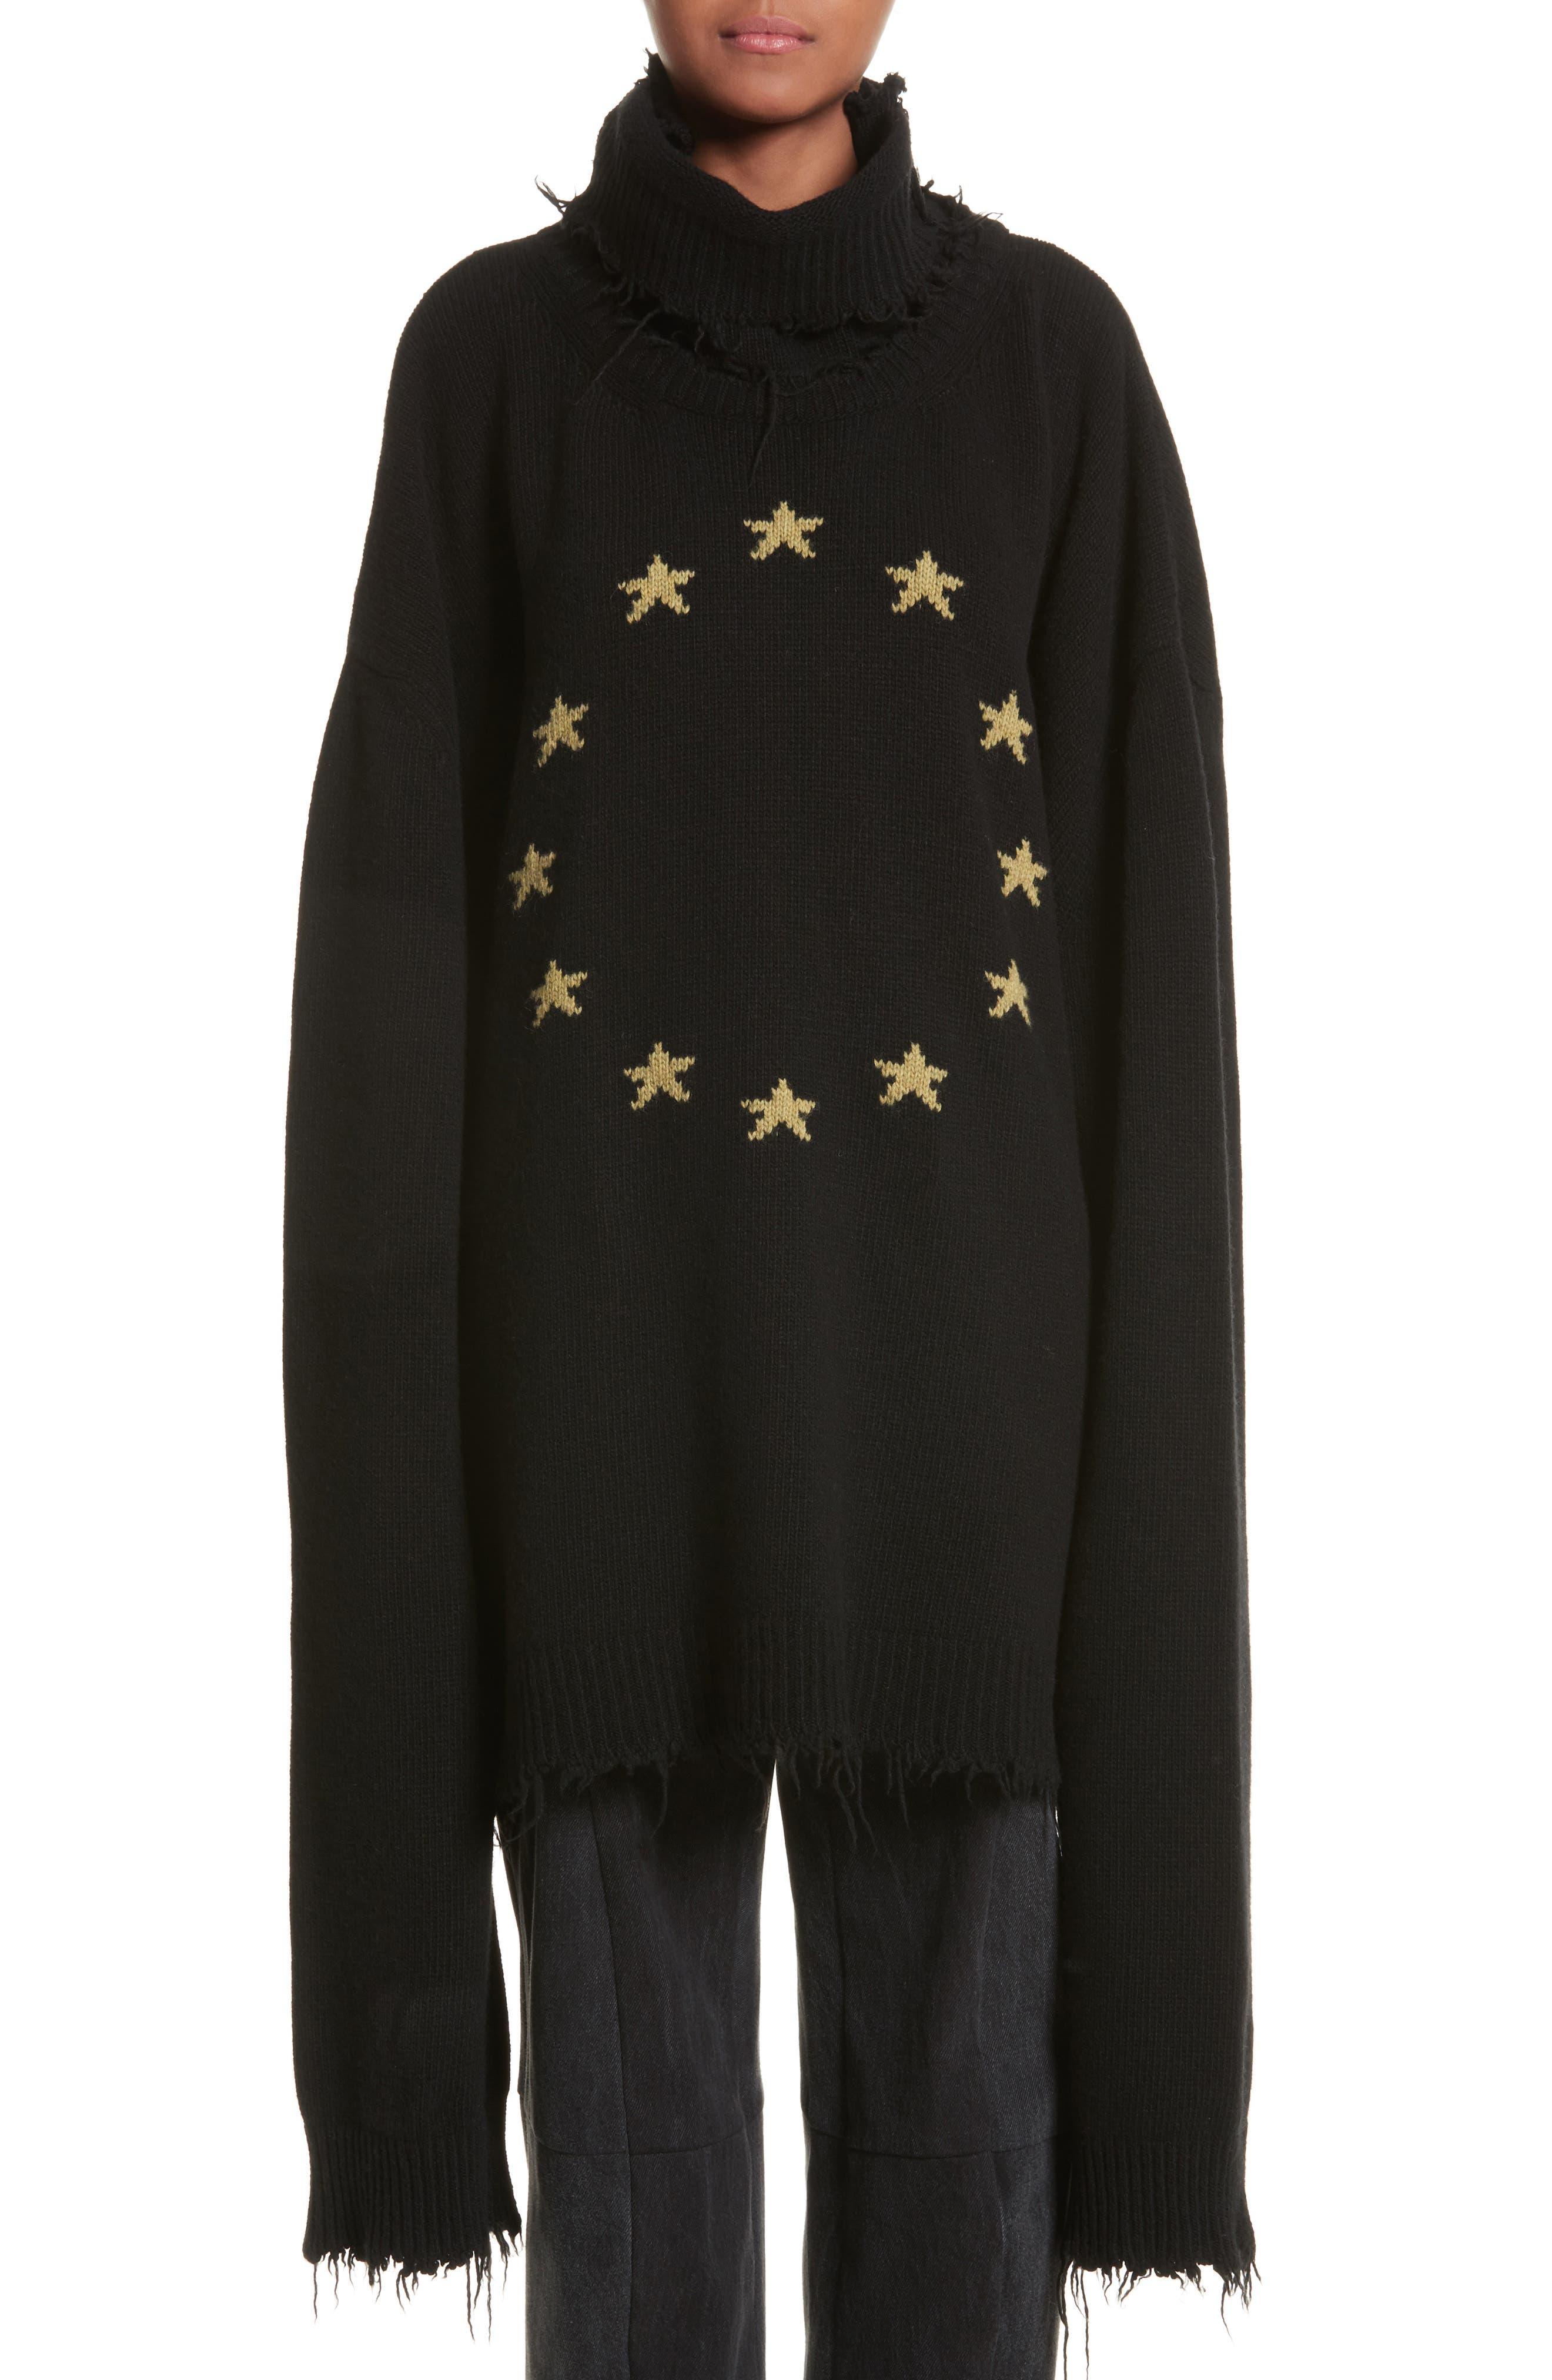 Star Turtleneck Sweater,                             Main thumbnail 1, color,                             001